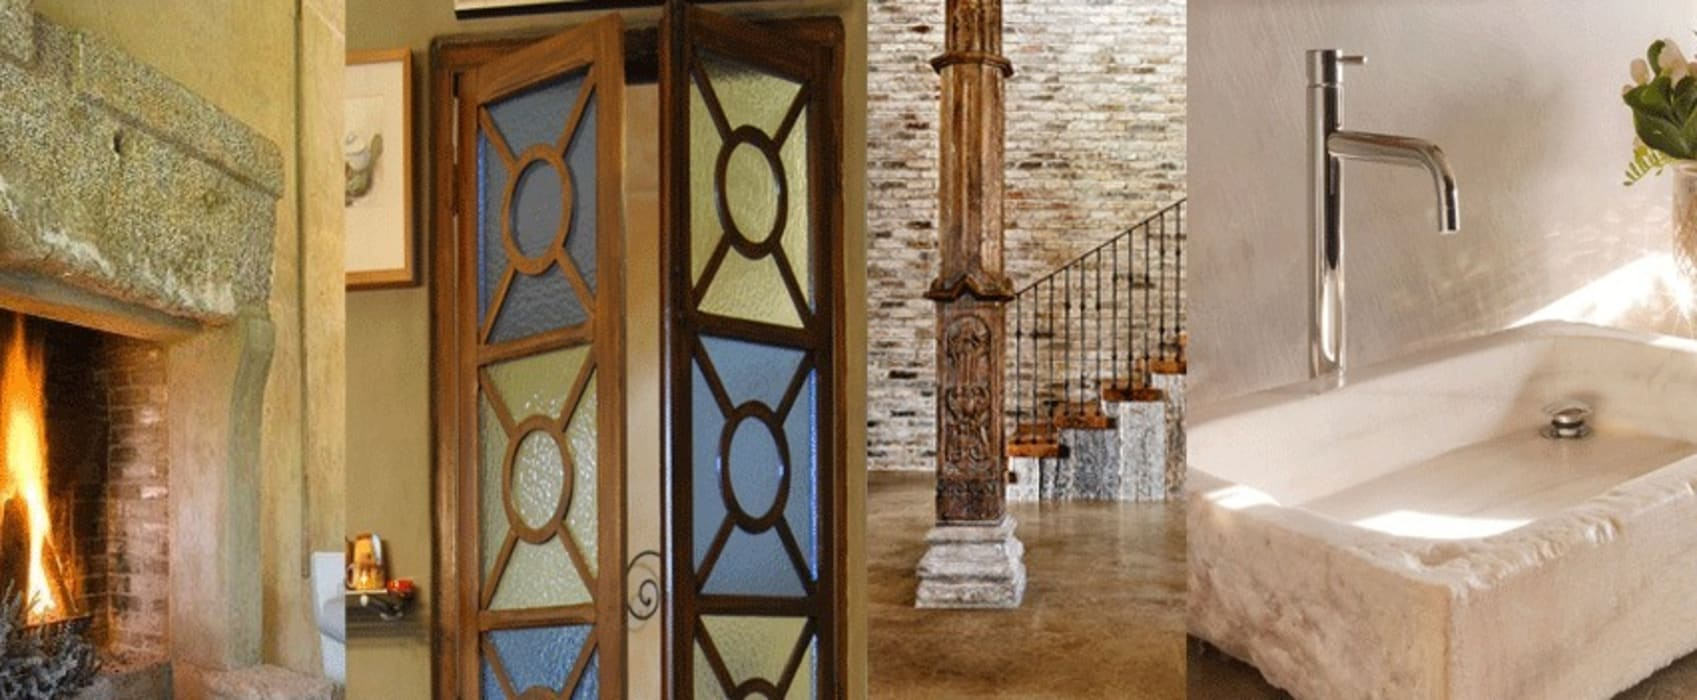 6 ideas que darán carácter a tu casa.: Casas de estilo ecléctico de Anticuable.com